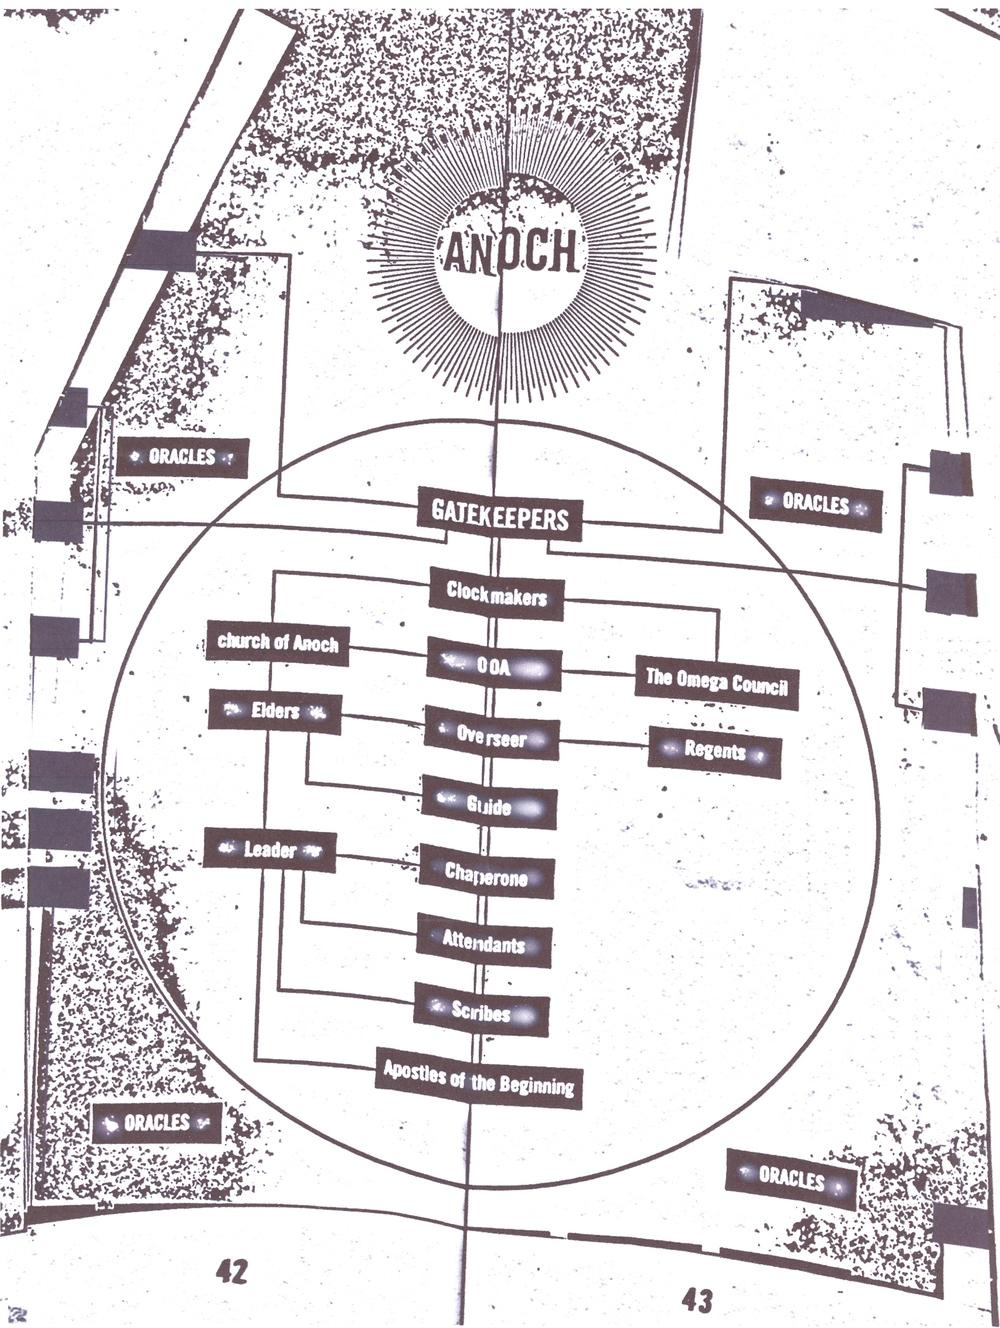 Organizational chart of the OOA.